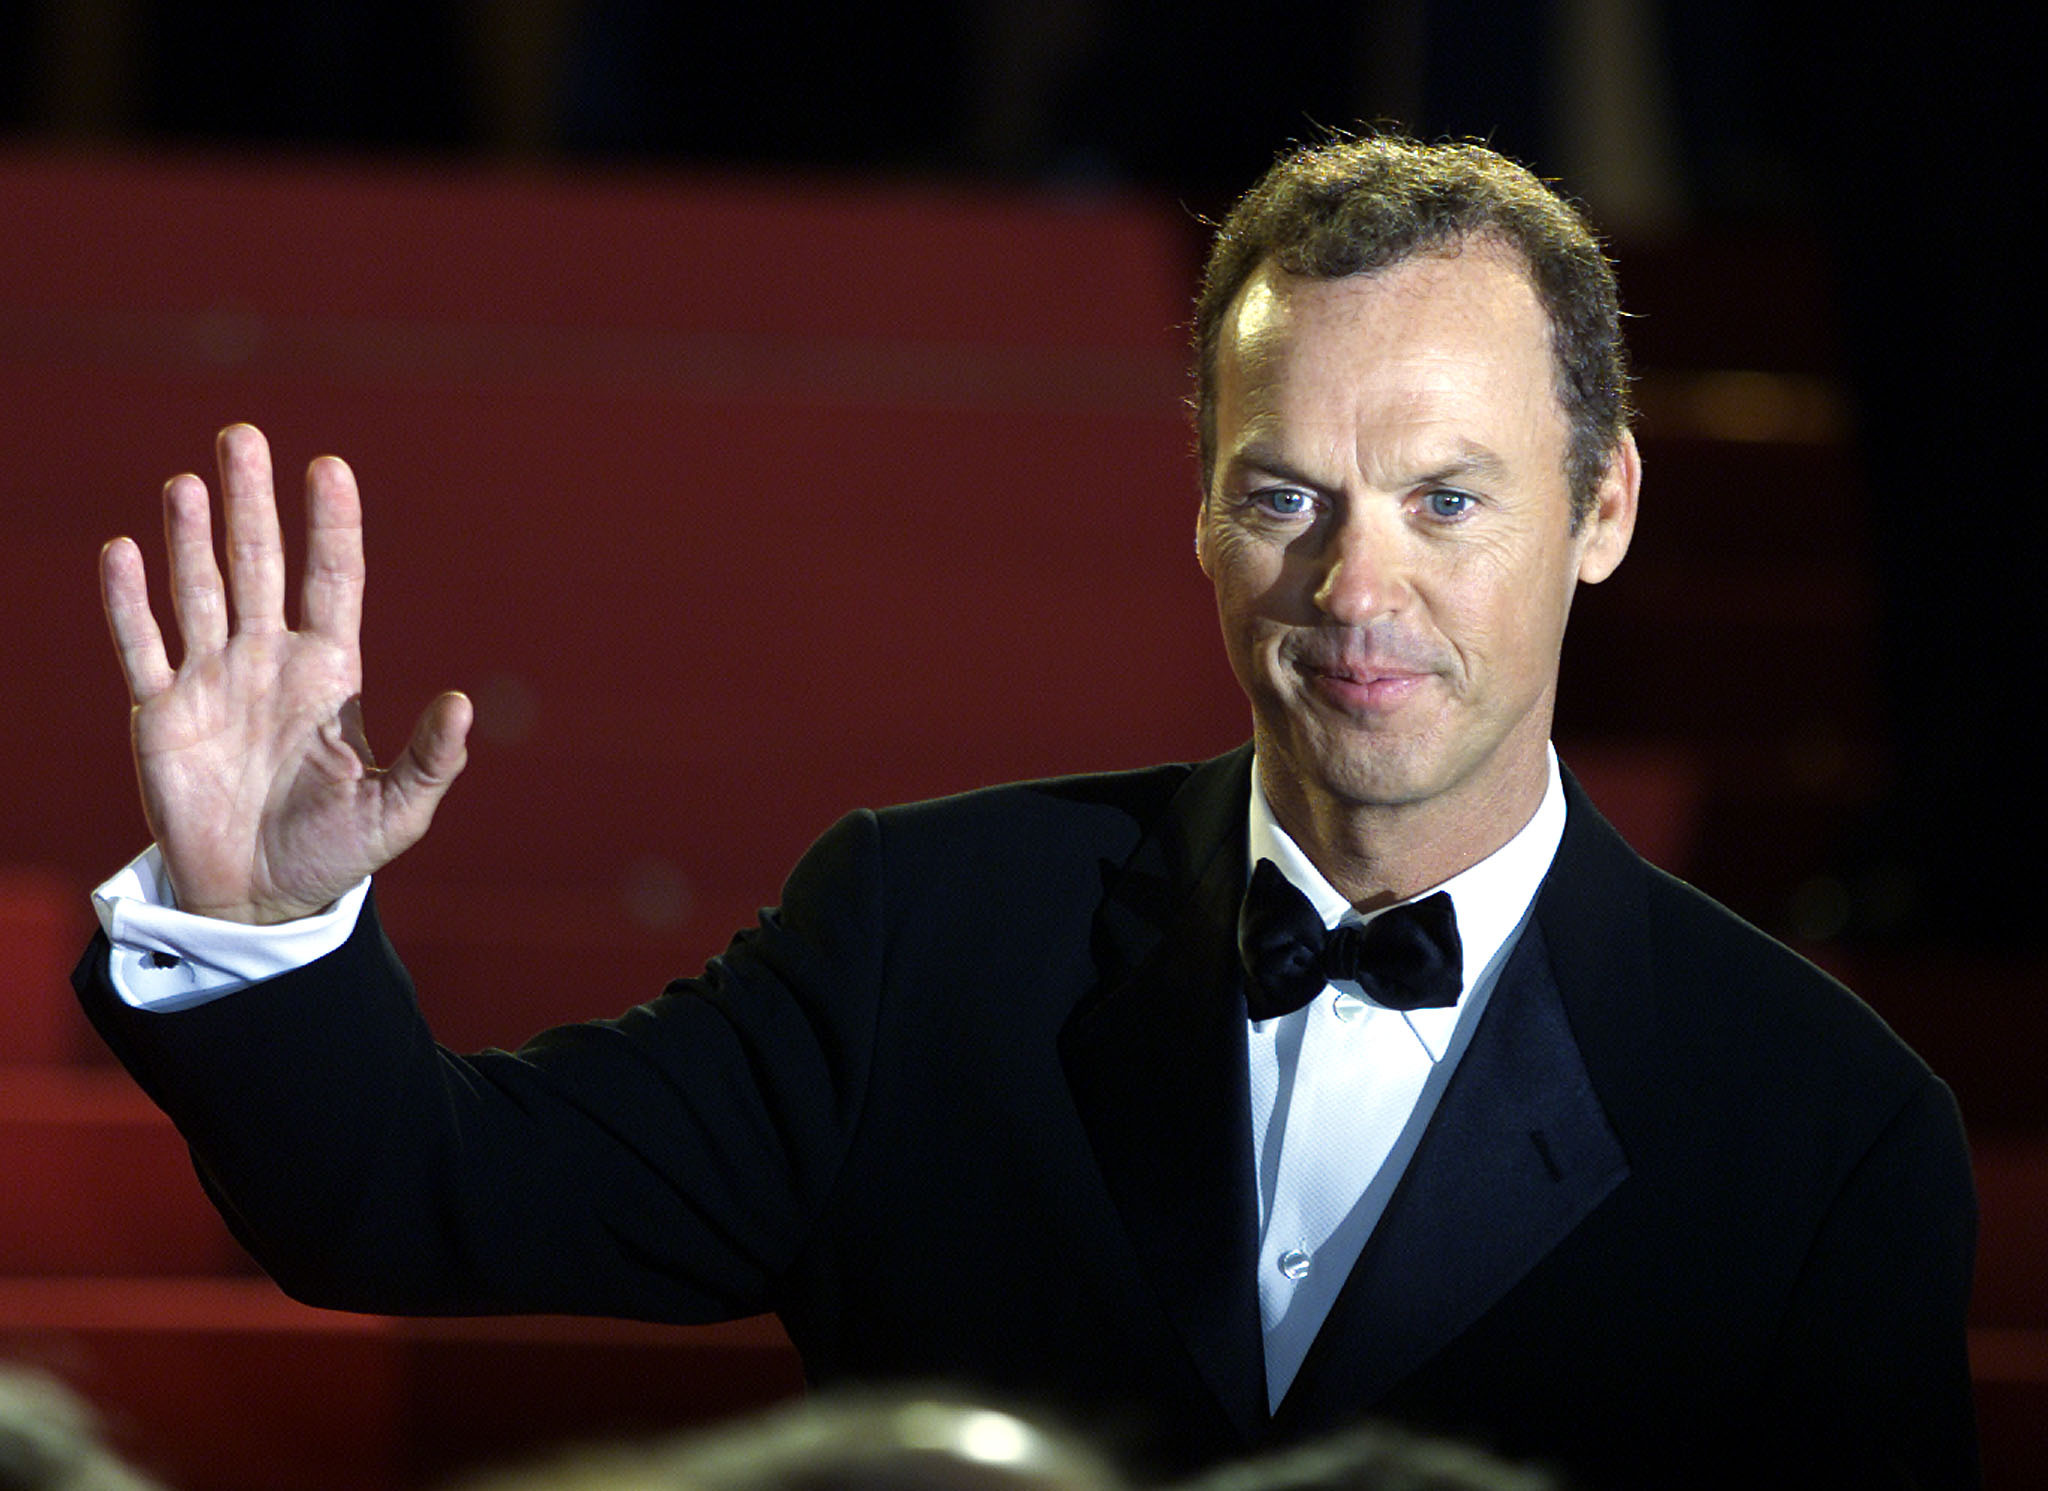 Michael Keaton Hd Background